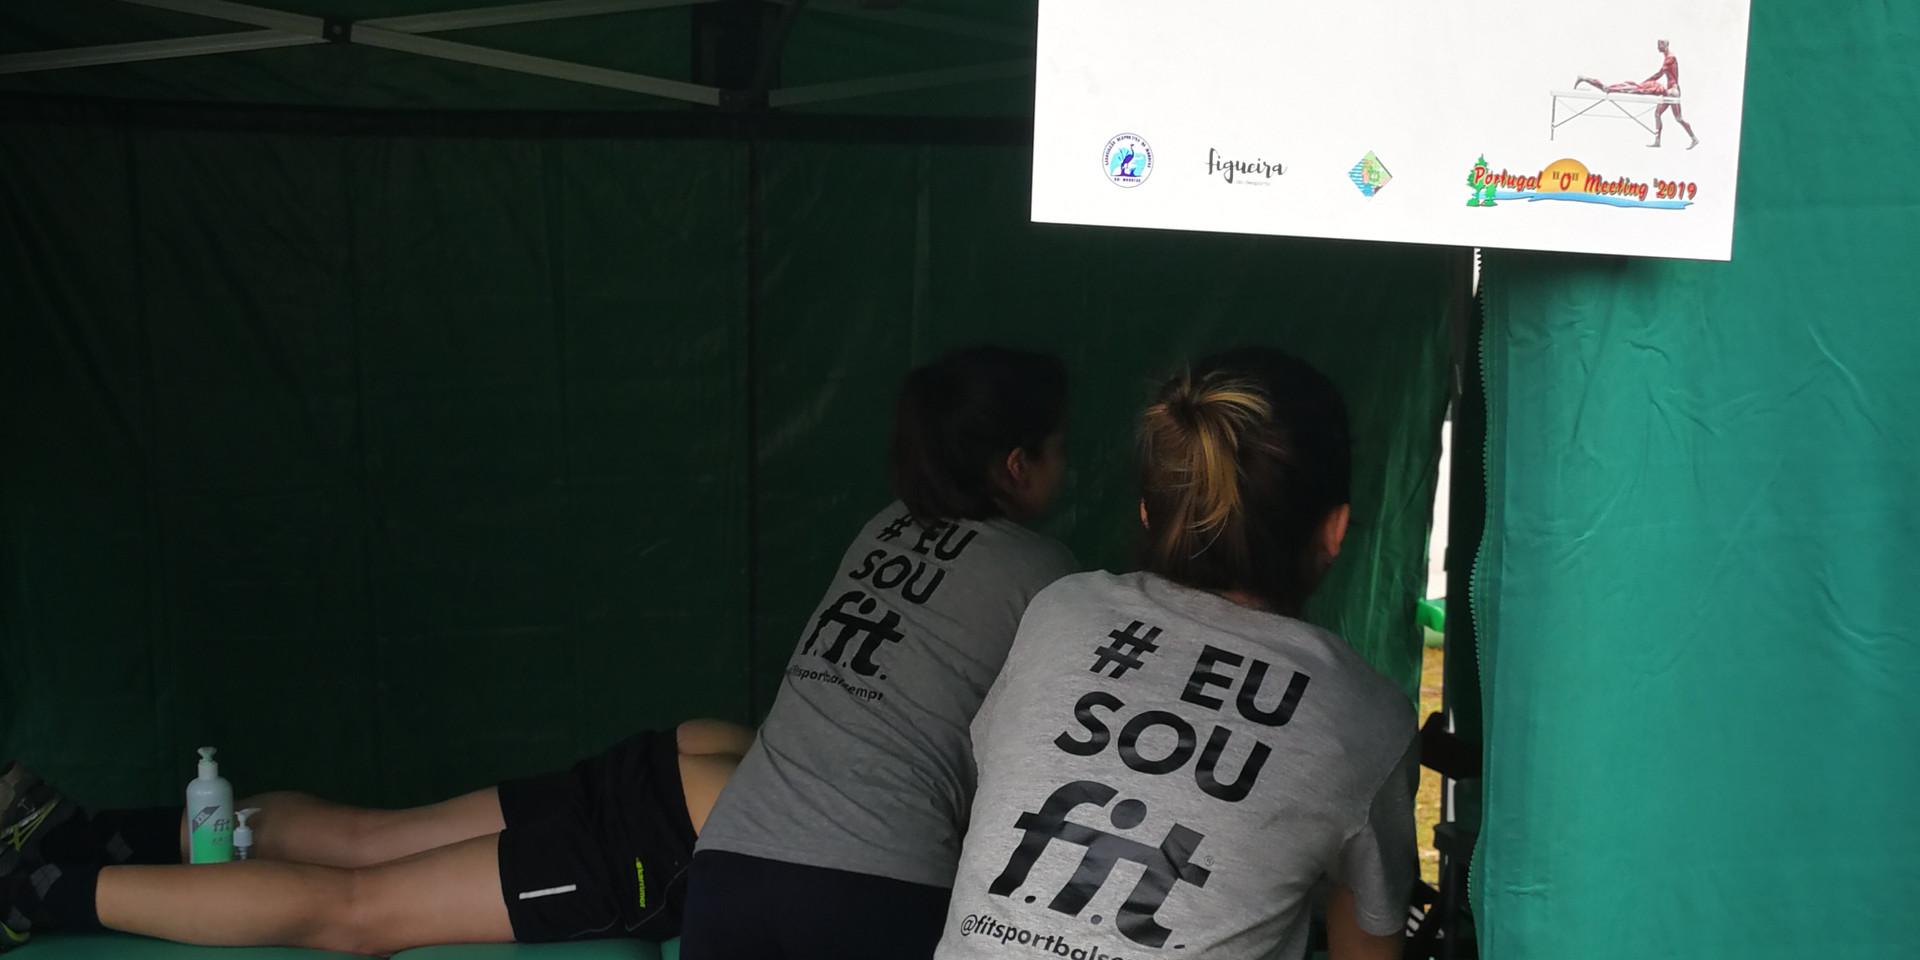 POM- Portugal o Meeting 2019